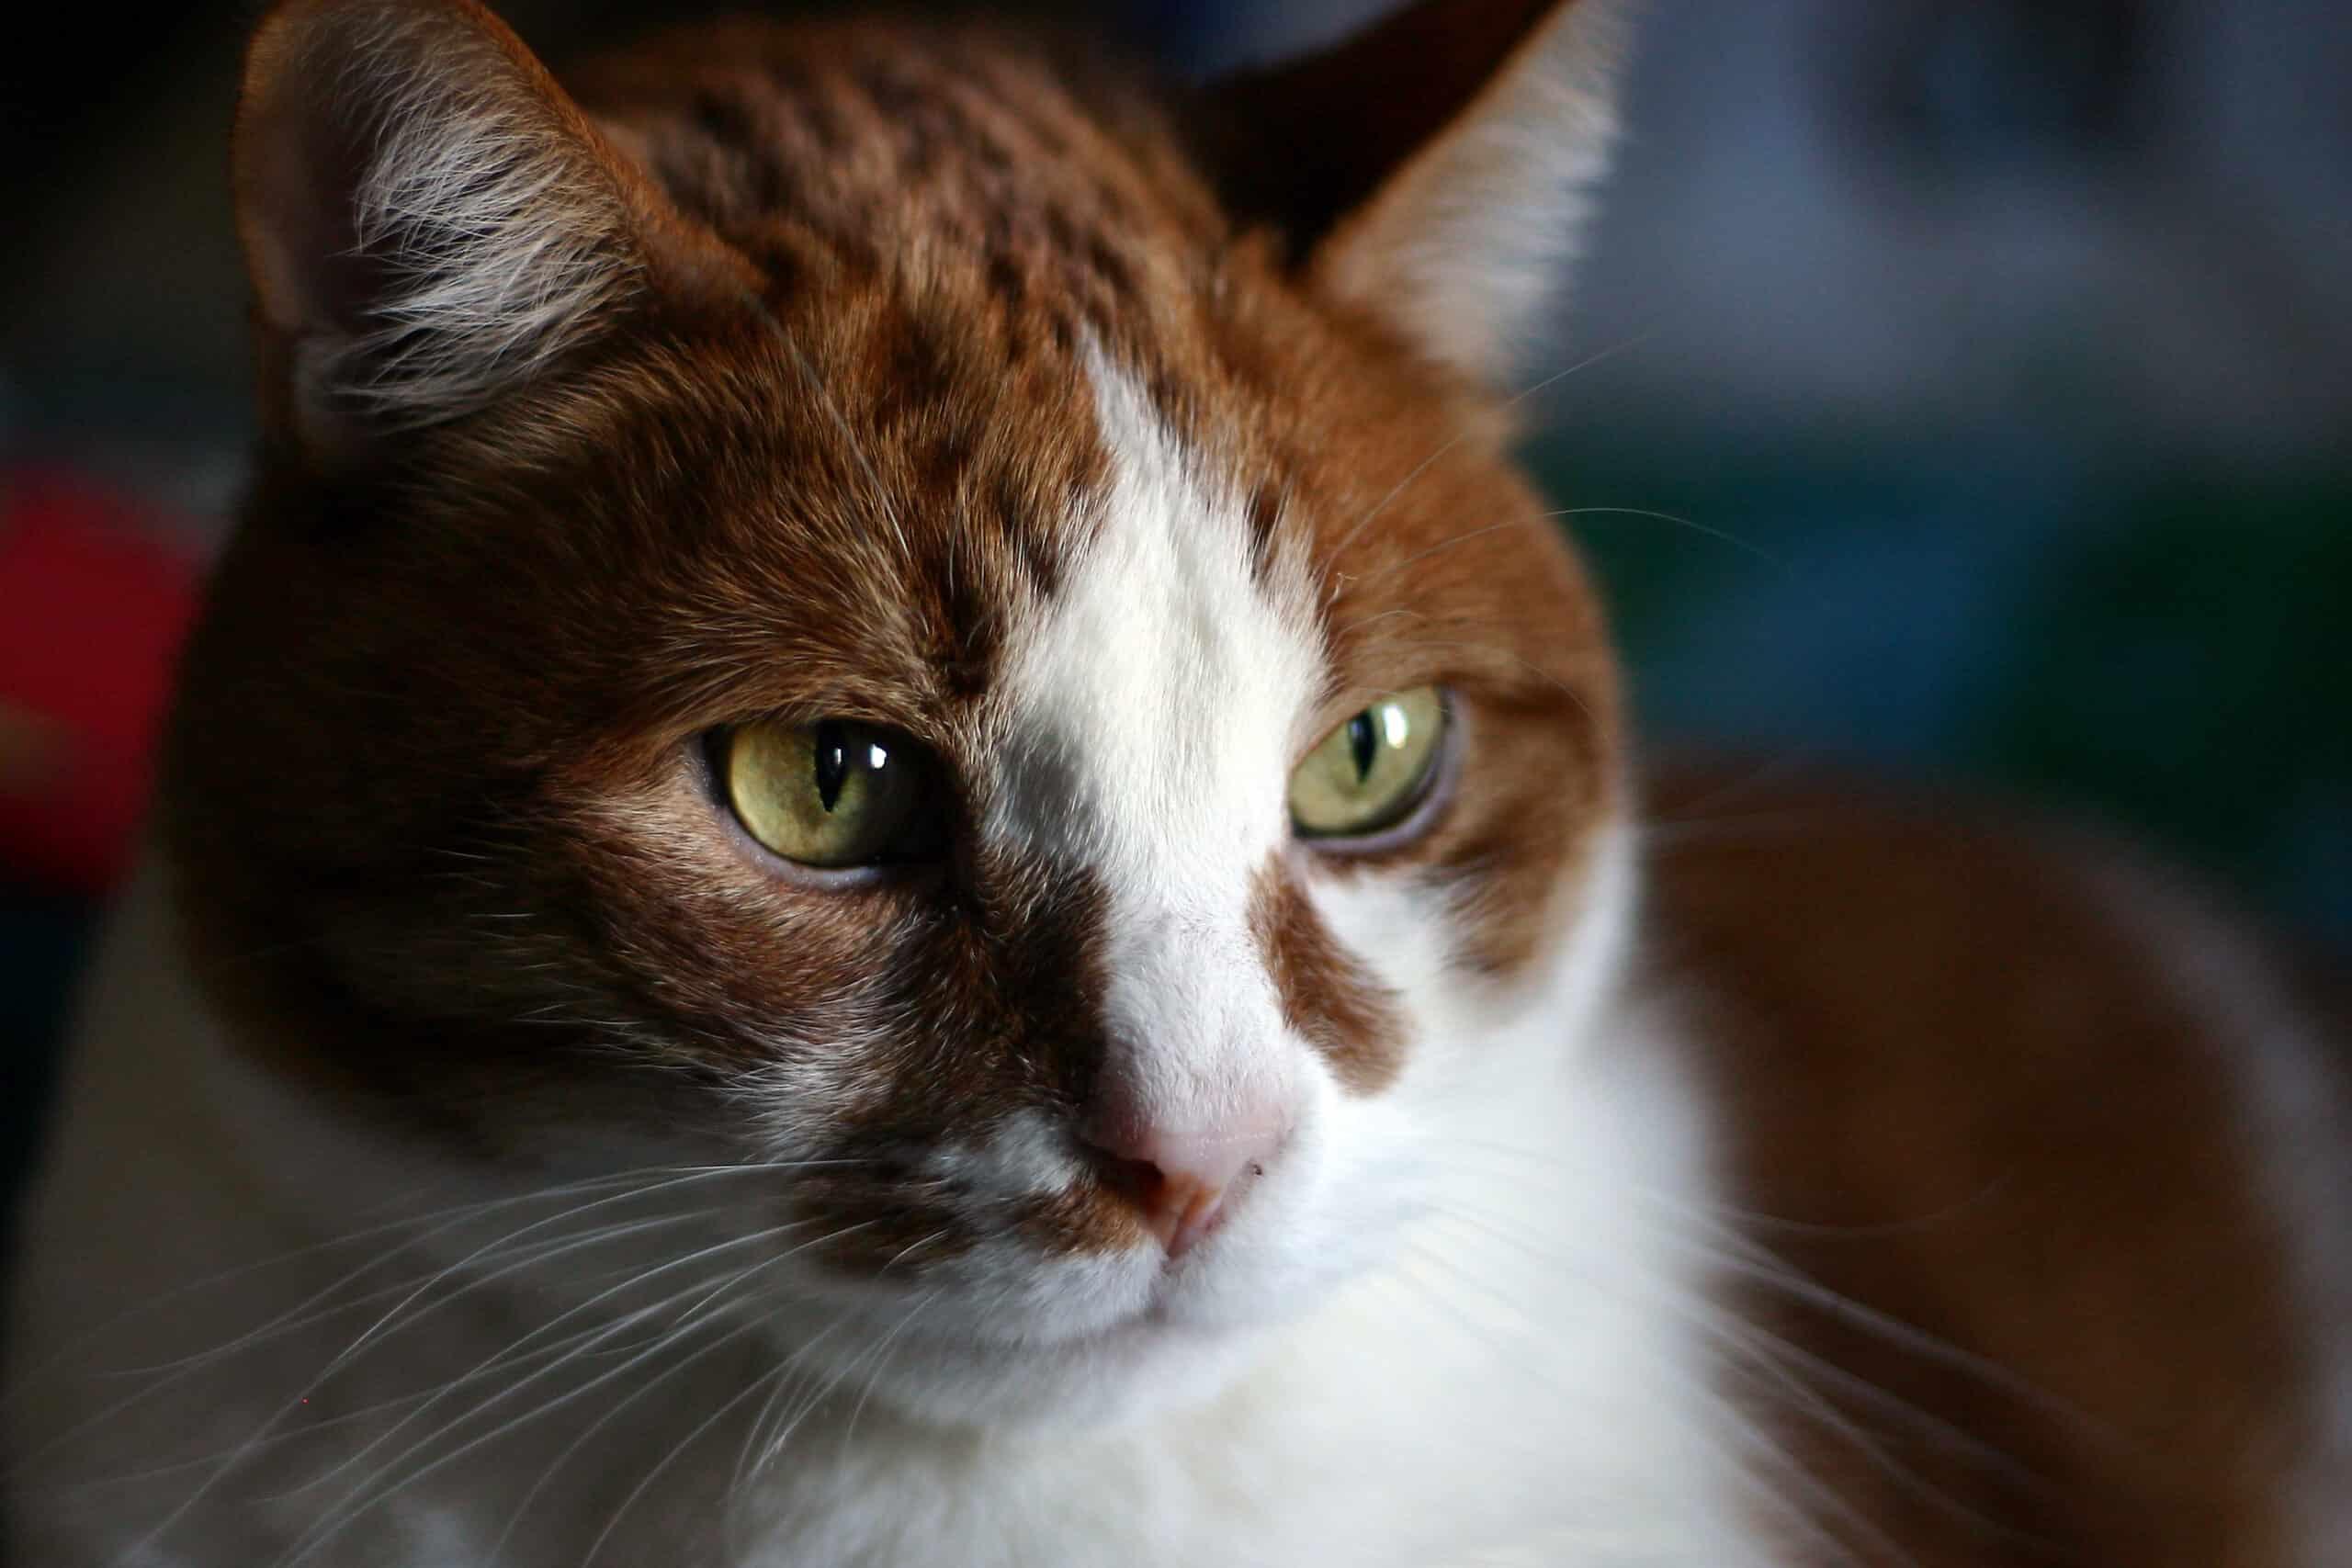 illnesses that cats often hide